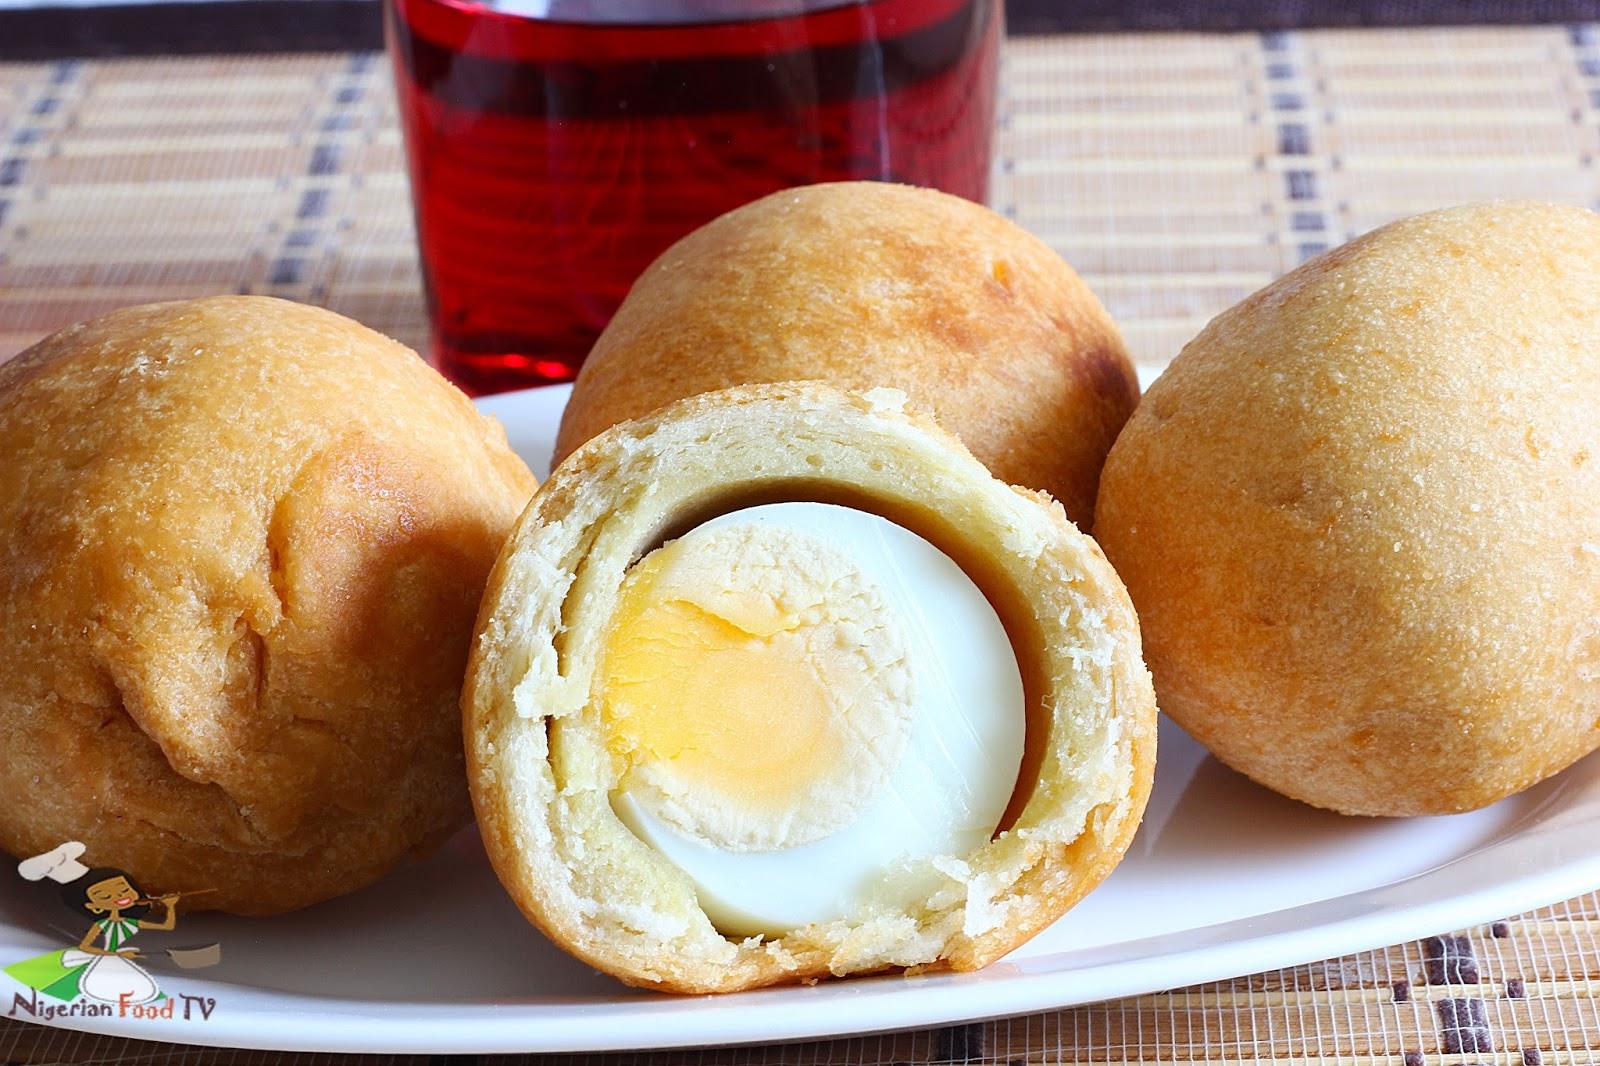 Nigerian Egg roll